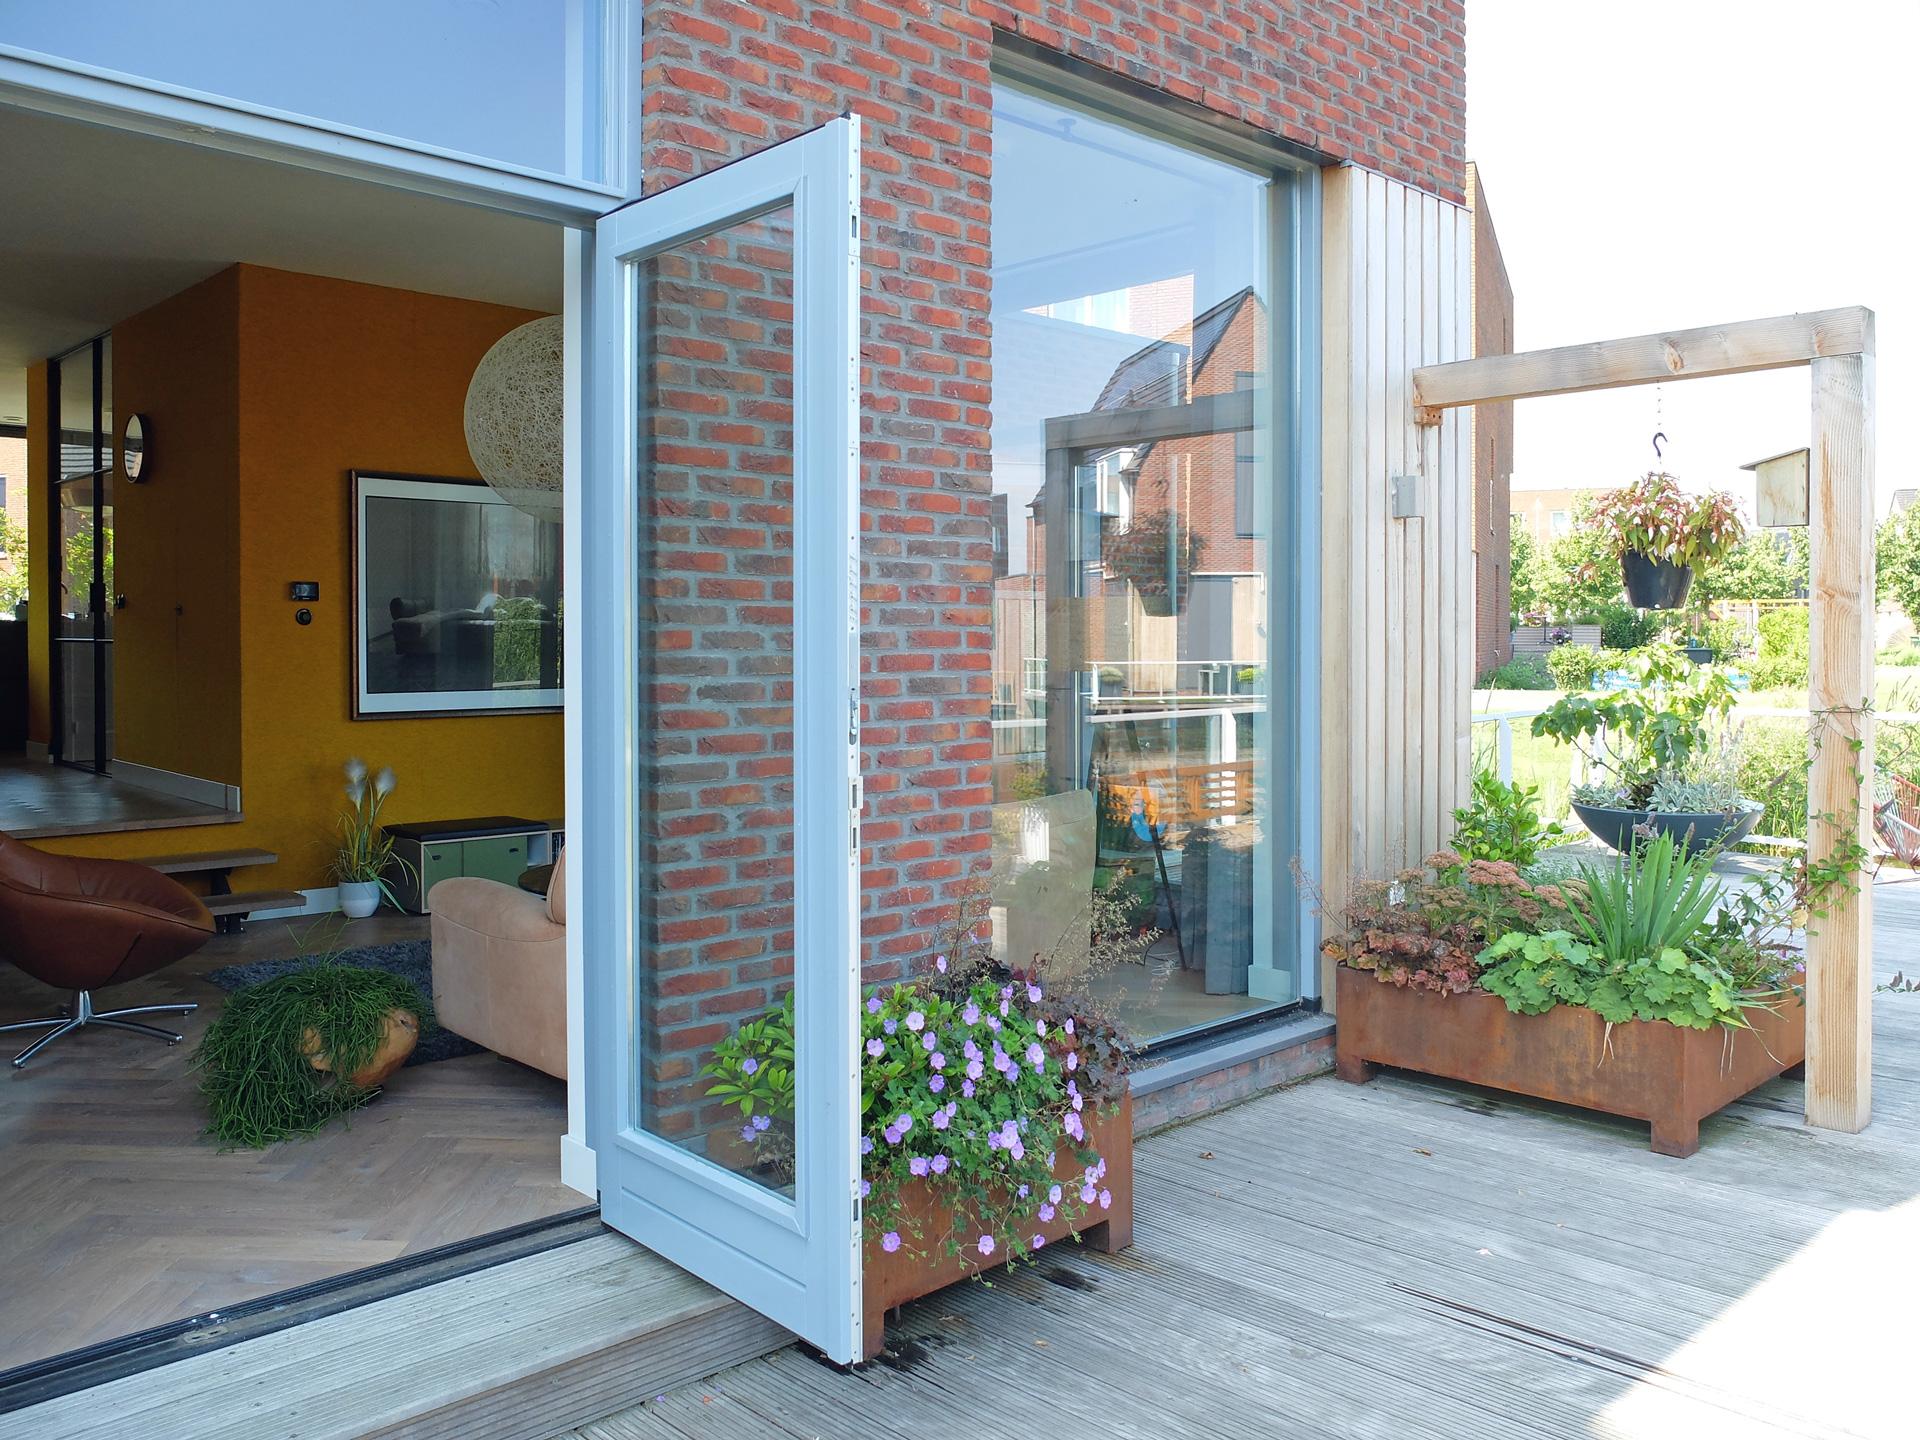 LAGADO-architects-orange-core-living-room-kitchen-level-felt-residential-interior-at-home-terrace